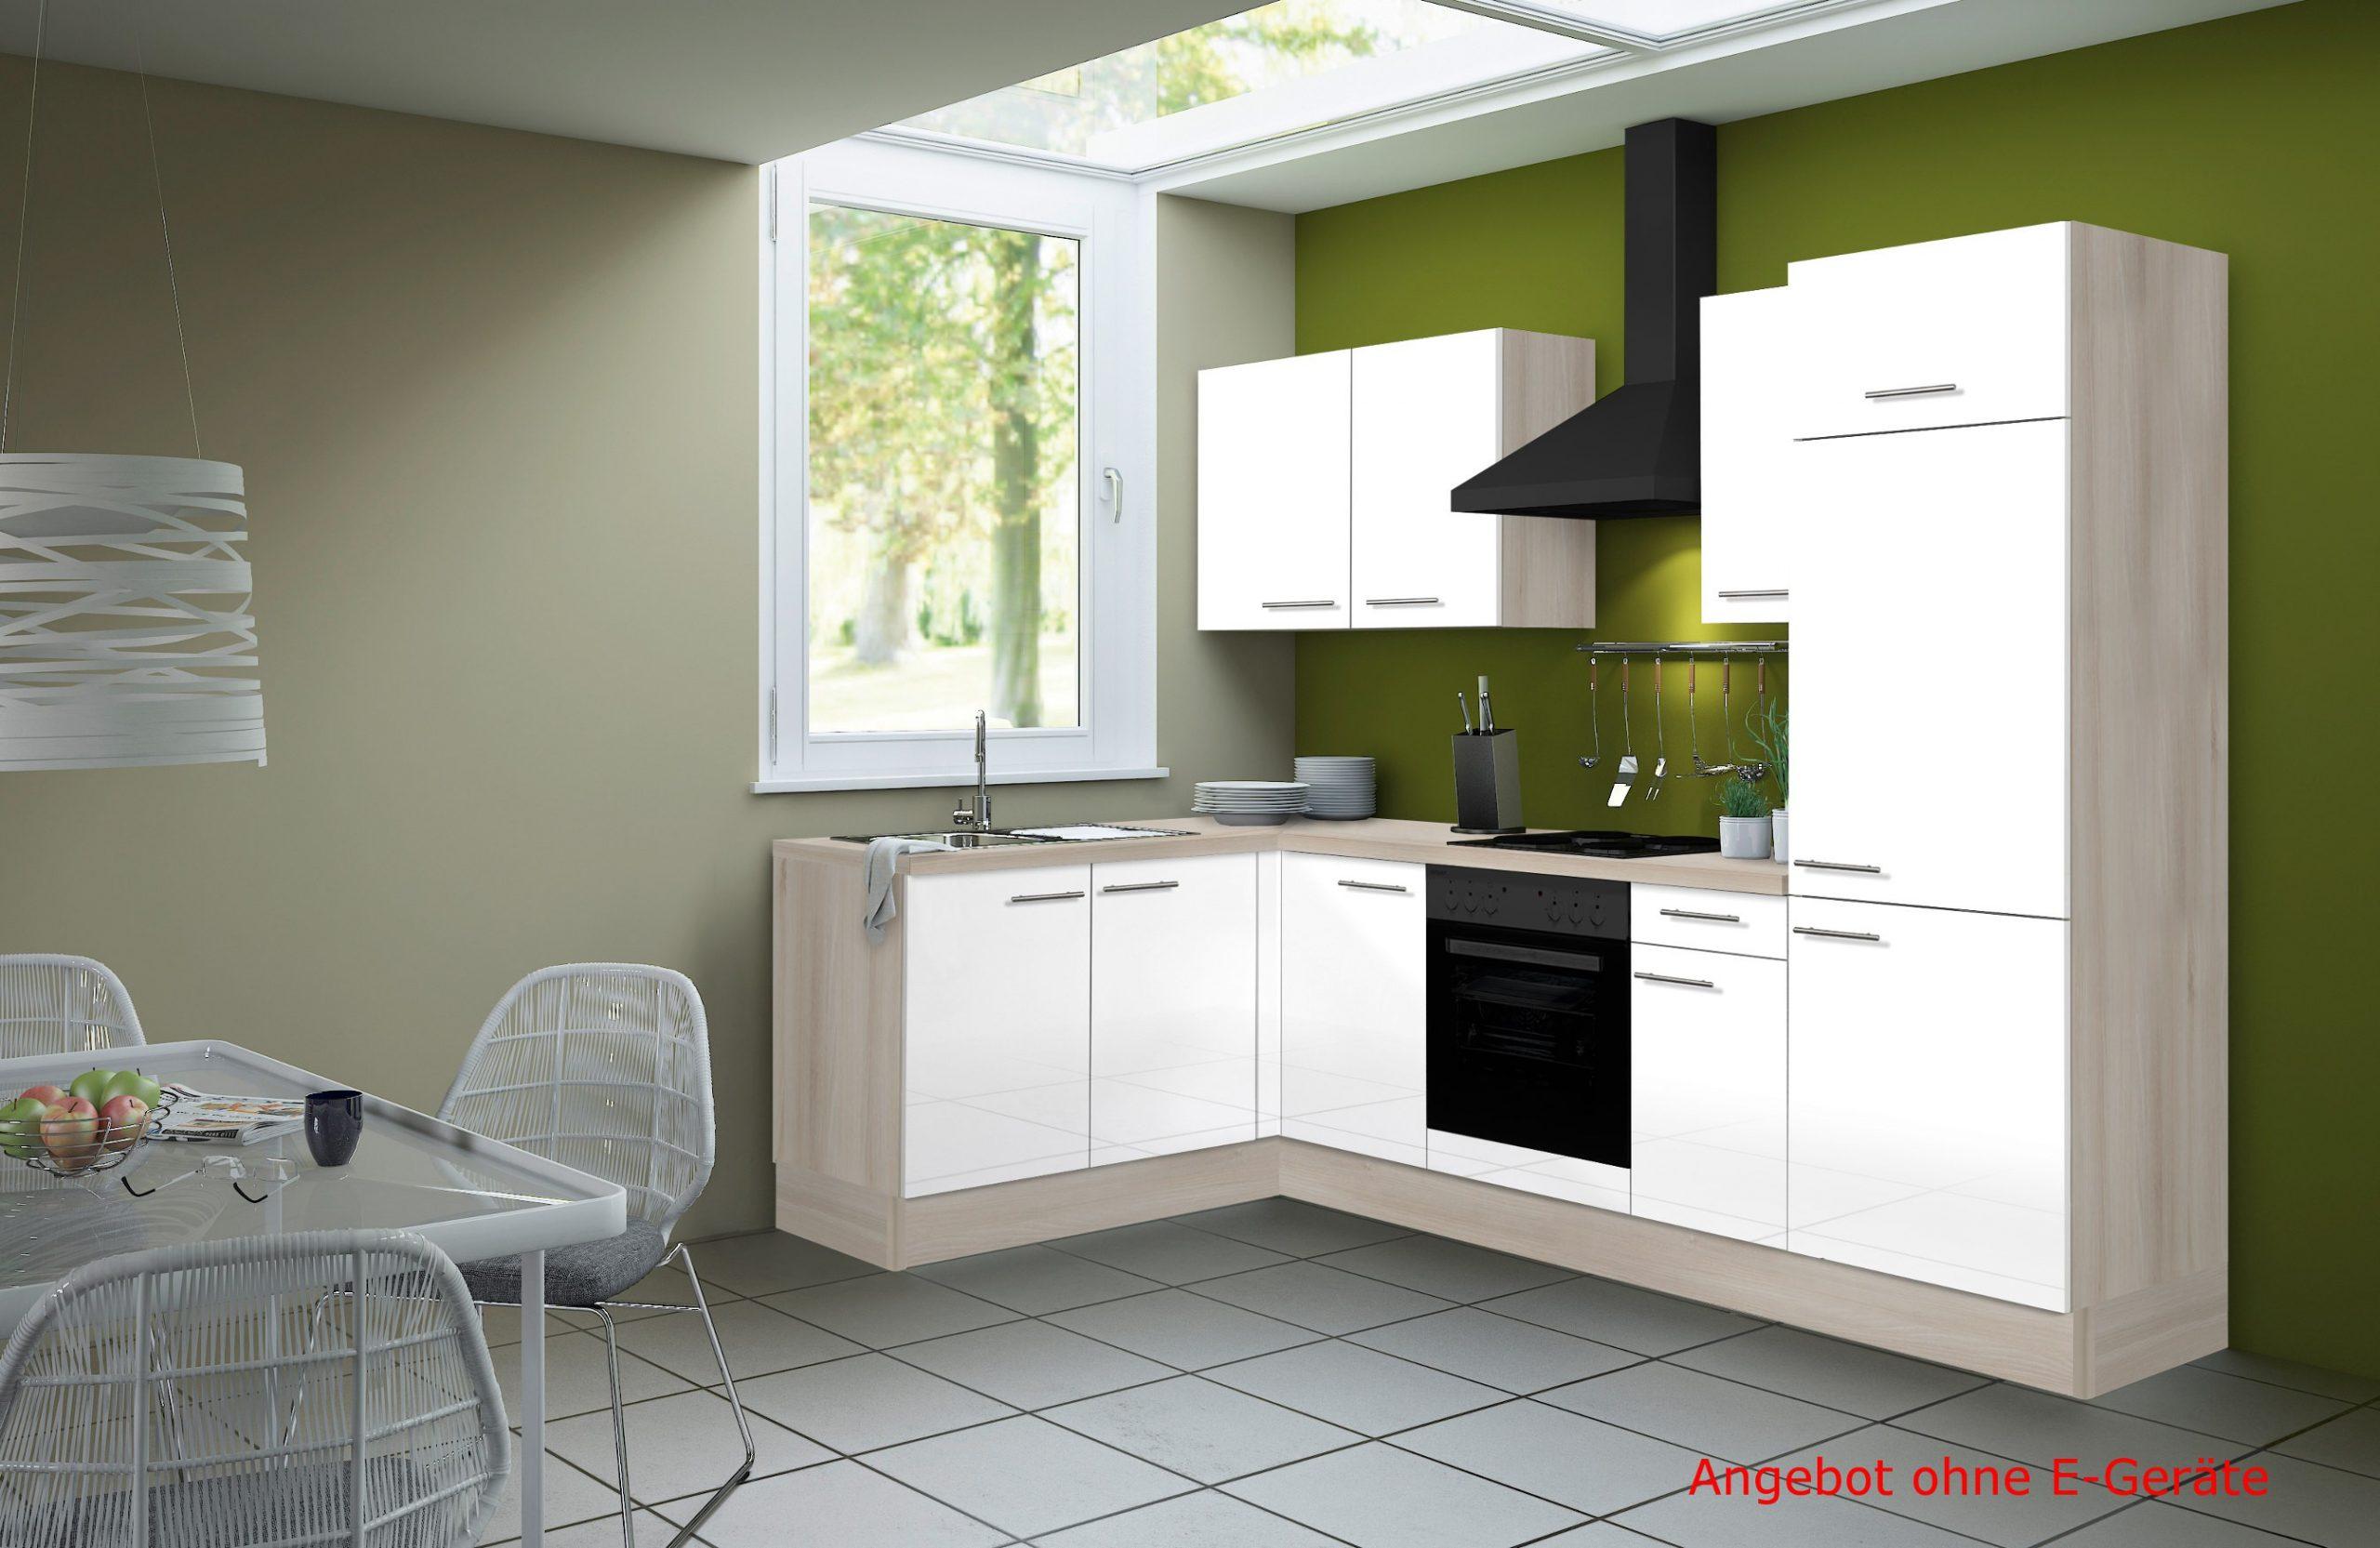 Full Size of Moderne Küche Ohne Geräte Küche Ohne Geräte Günstig Kaufen Küche Ohne Geräte Zu Verschenken Günstige Küche Ohne Geräte Küche Küche Ohne Geräte